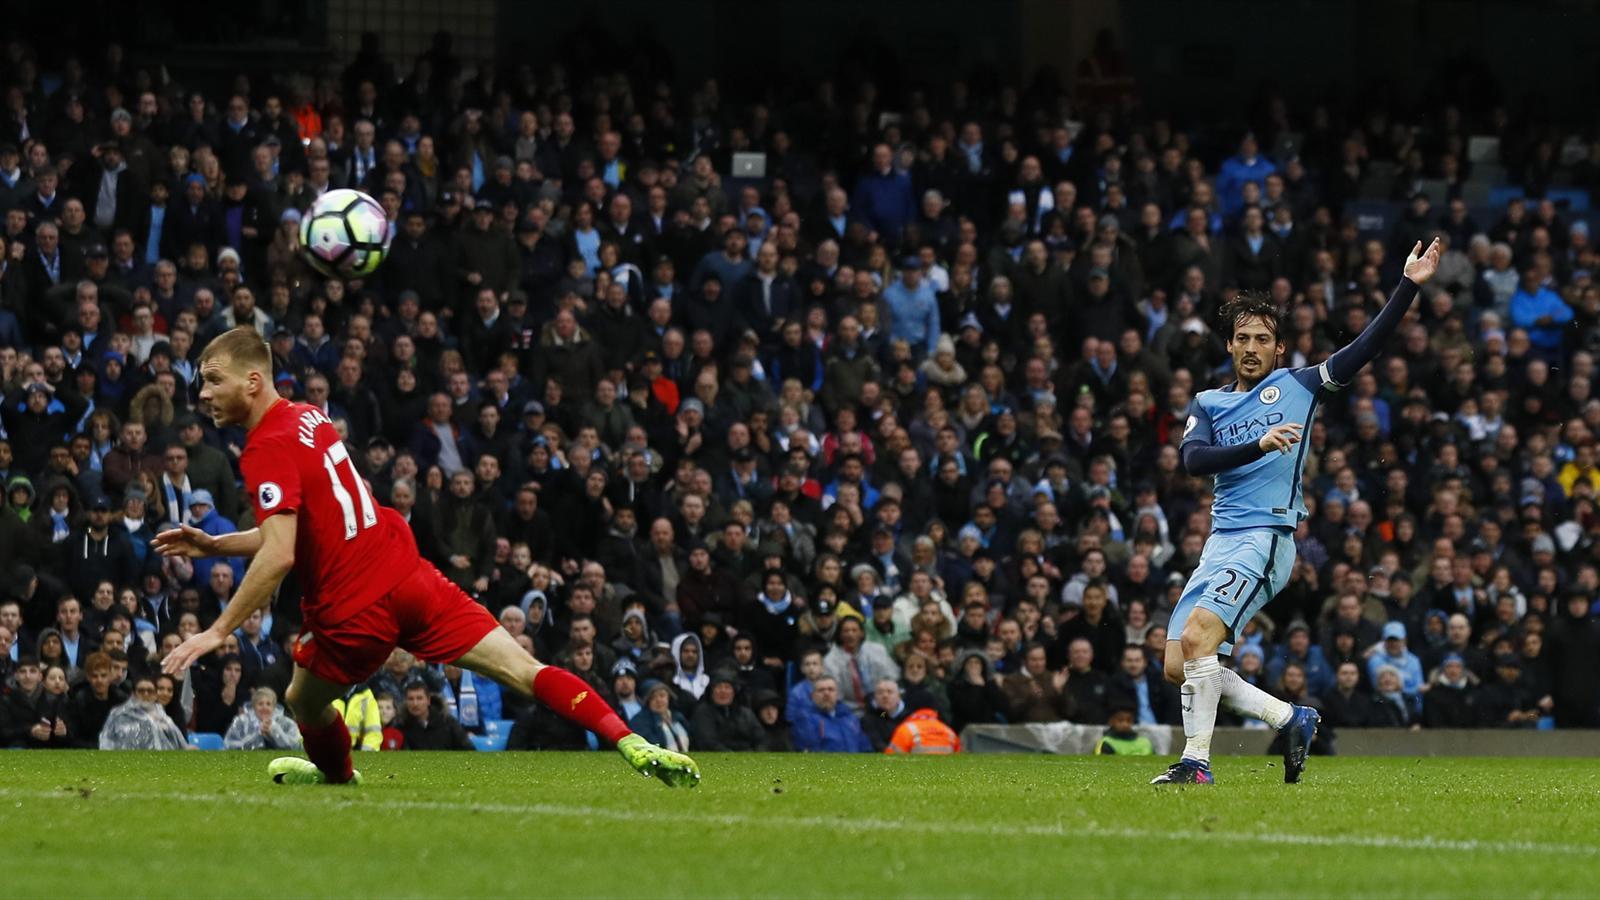 Liverpool Man City Live Eurosport